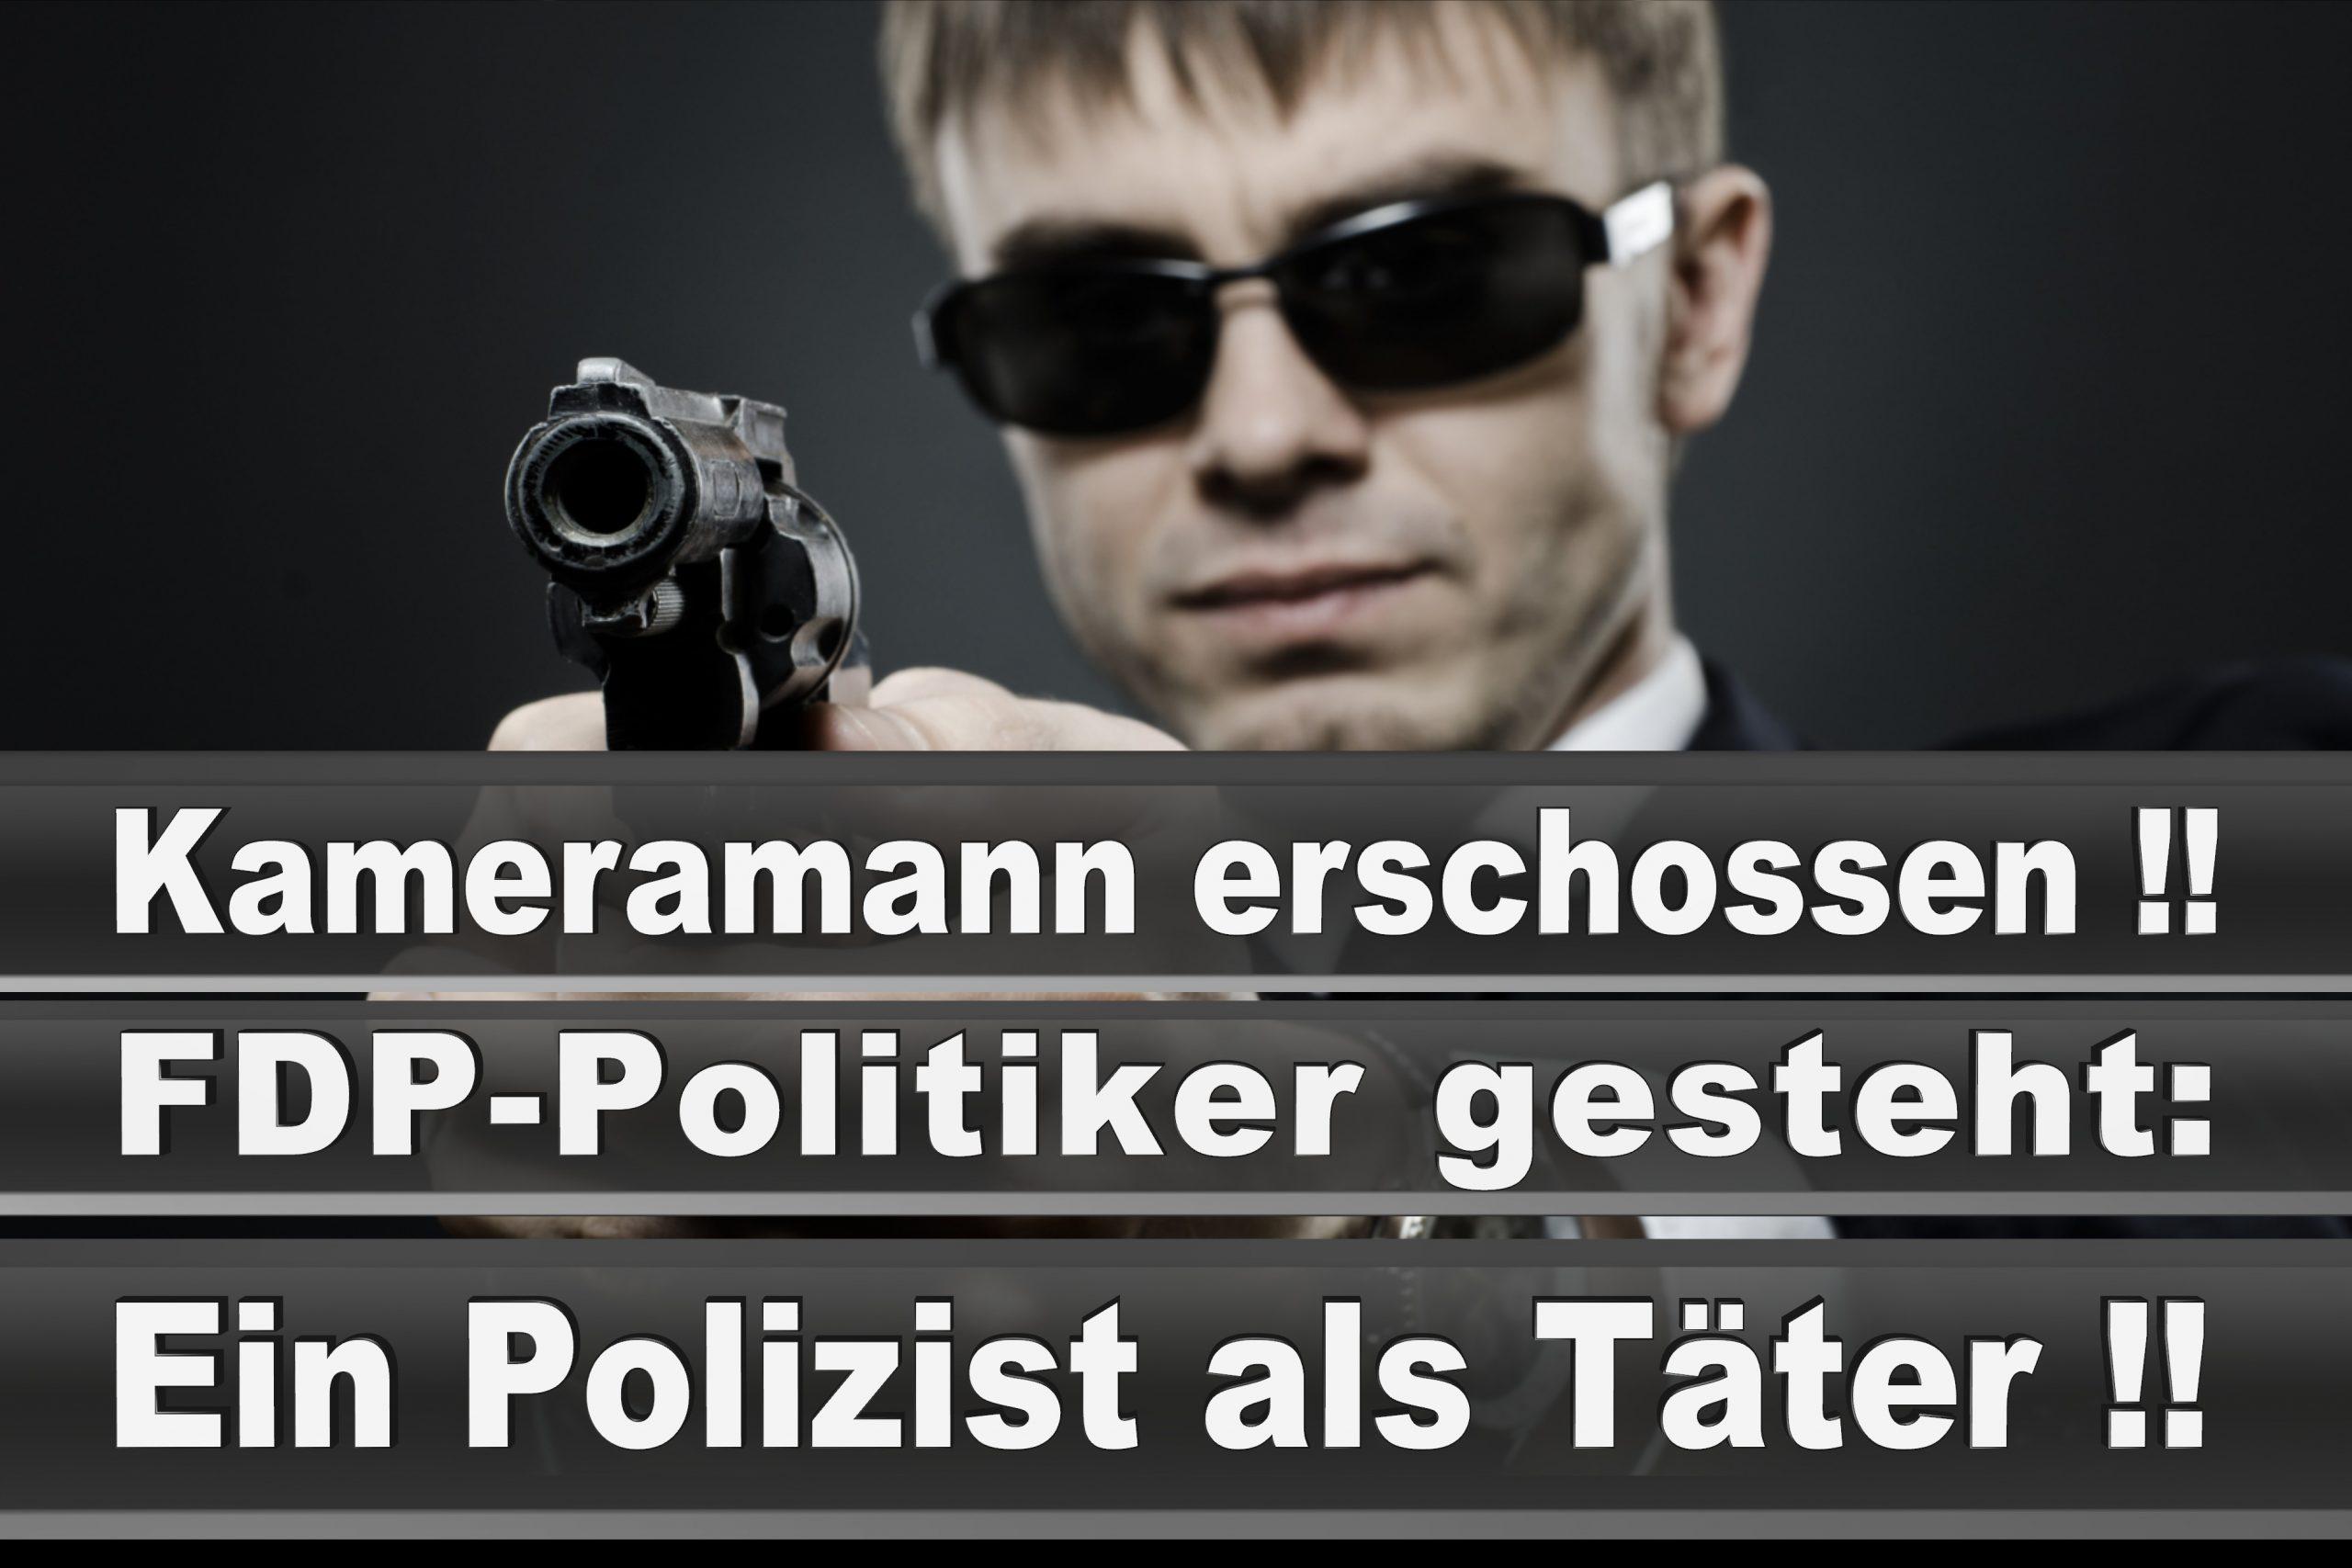 Bundestagswahl 2021 Stimmzettel CDU SPD Thomas Koerner FDP Hövelhof